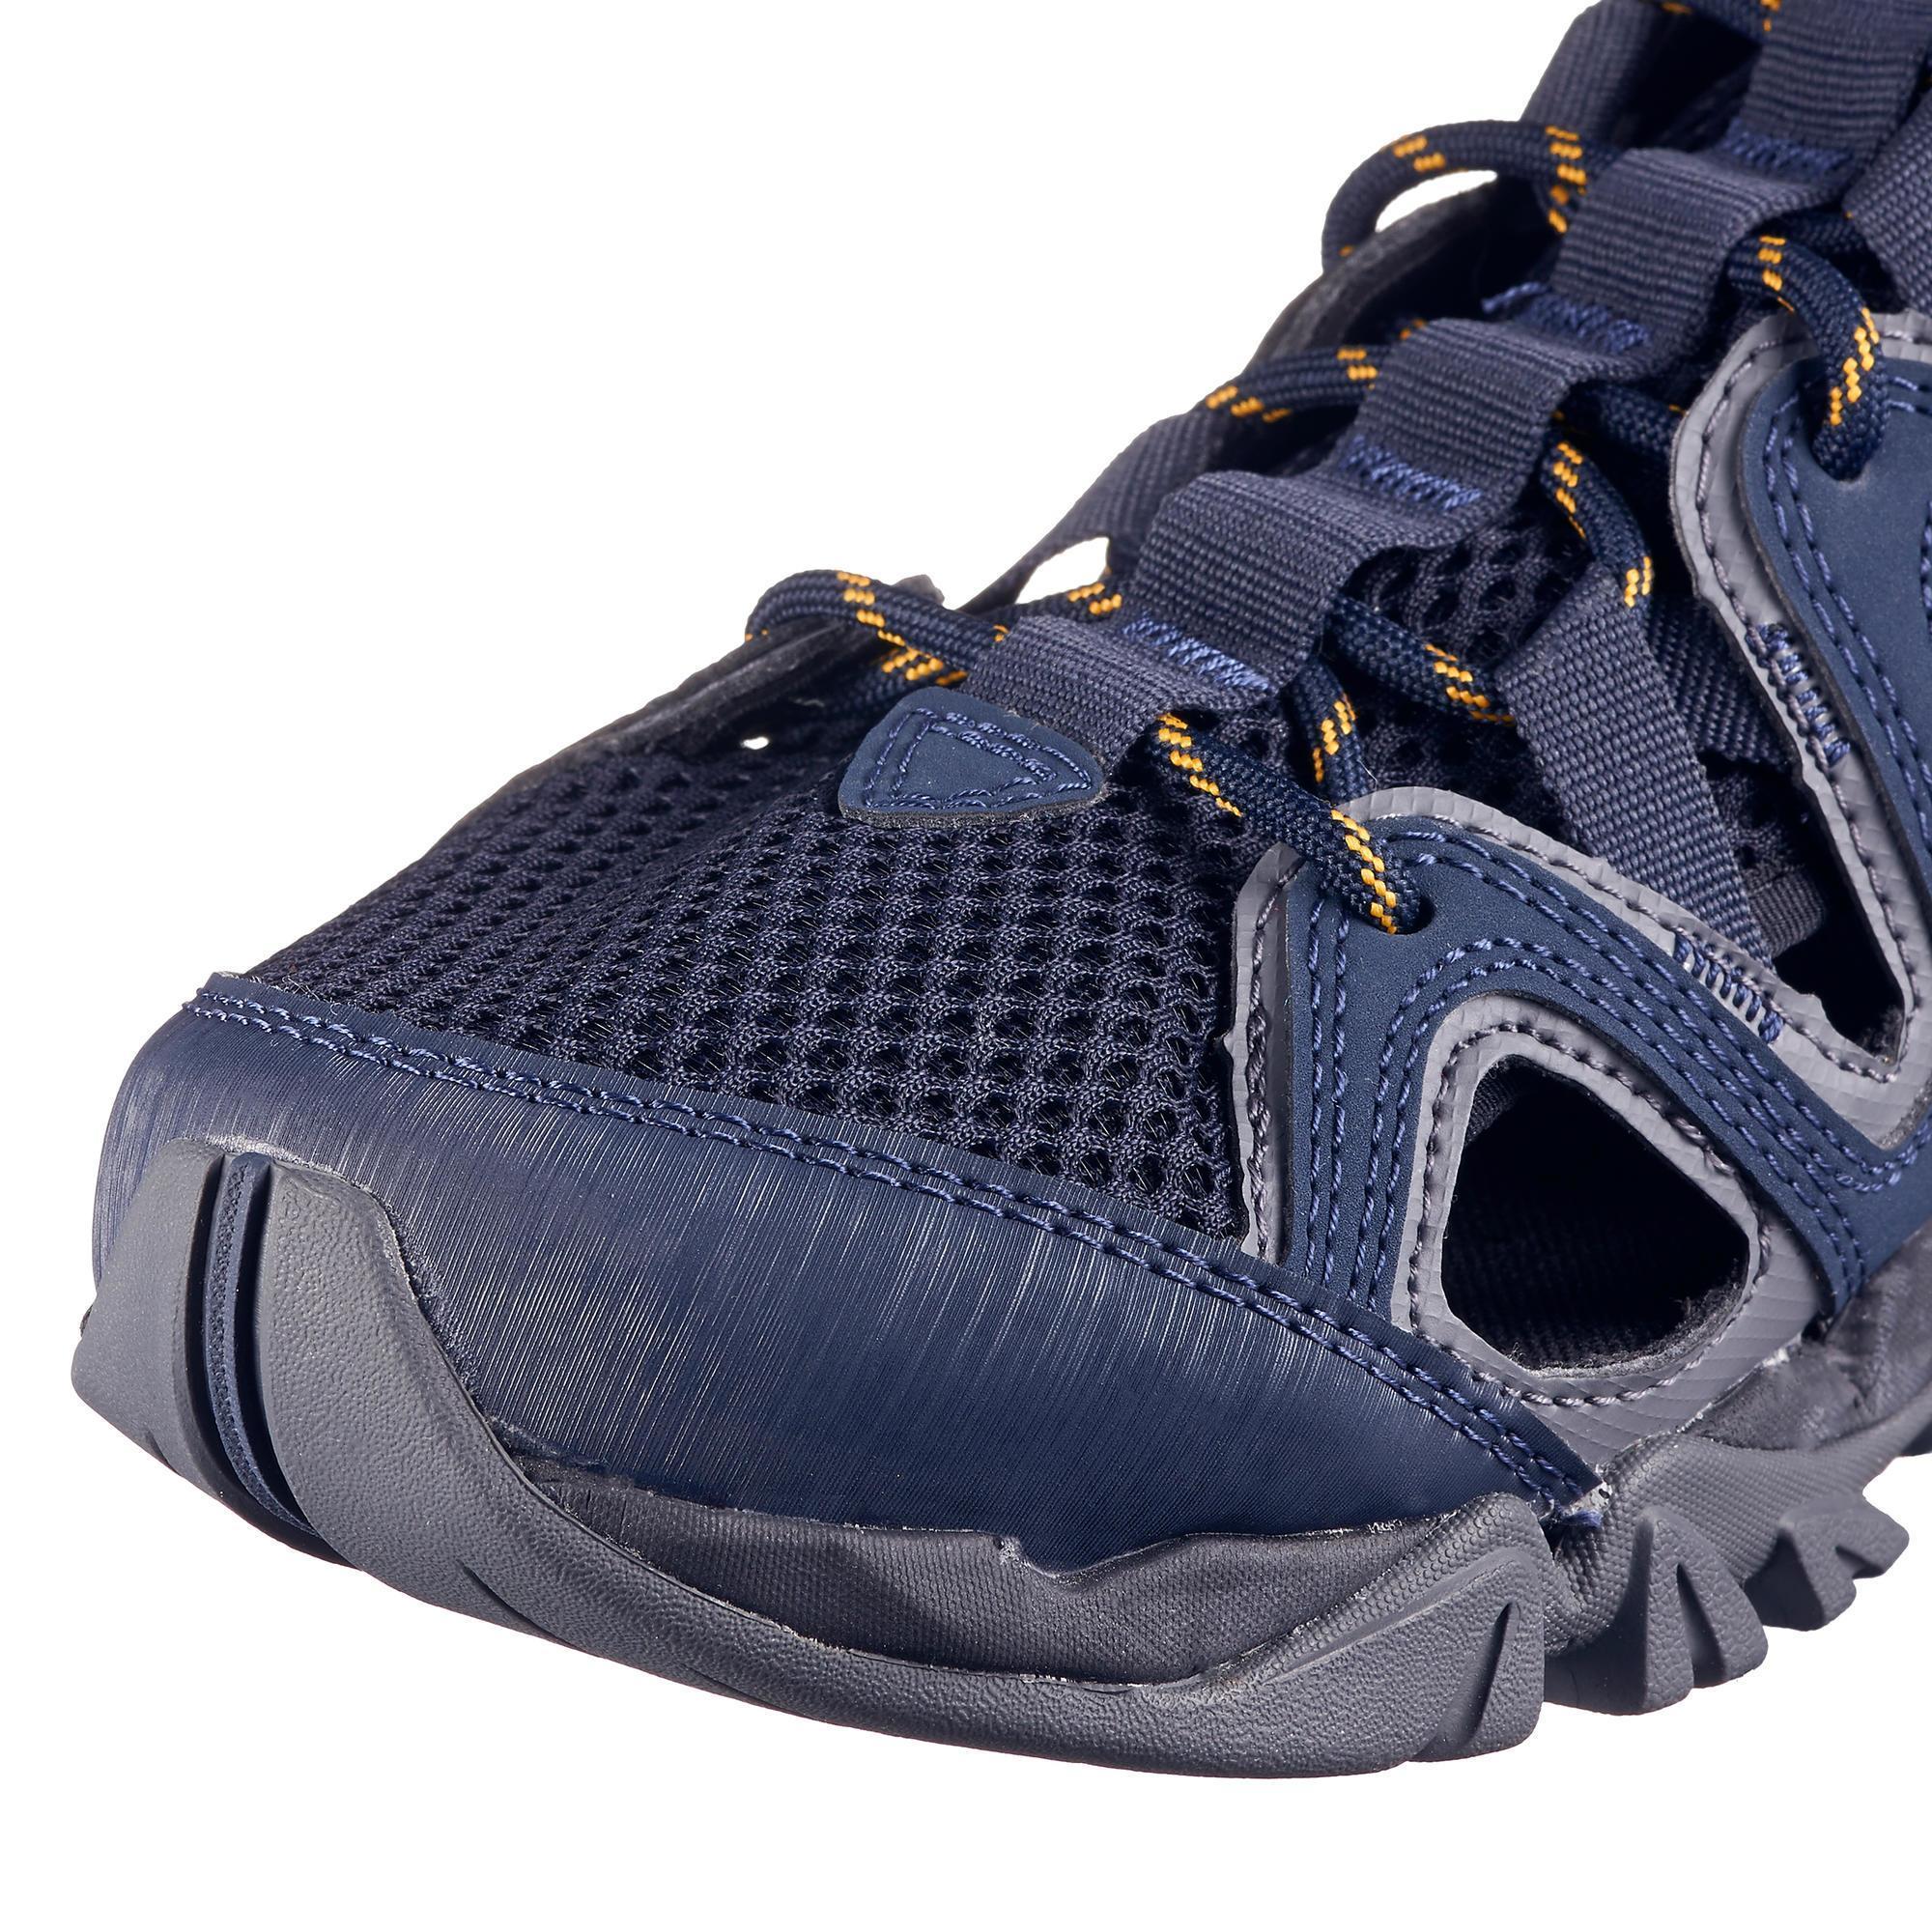 Zapatillas Impermeables para Hombre Merrell Tetrex Crest Wrap